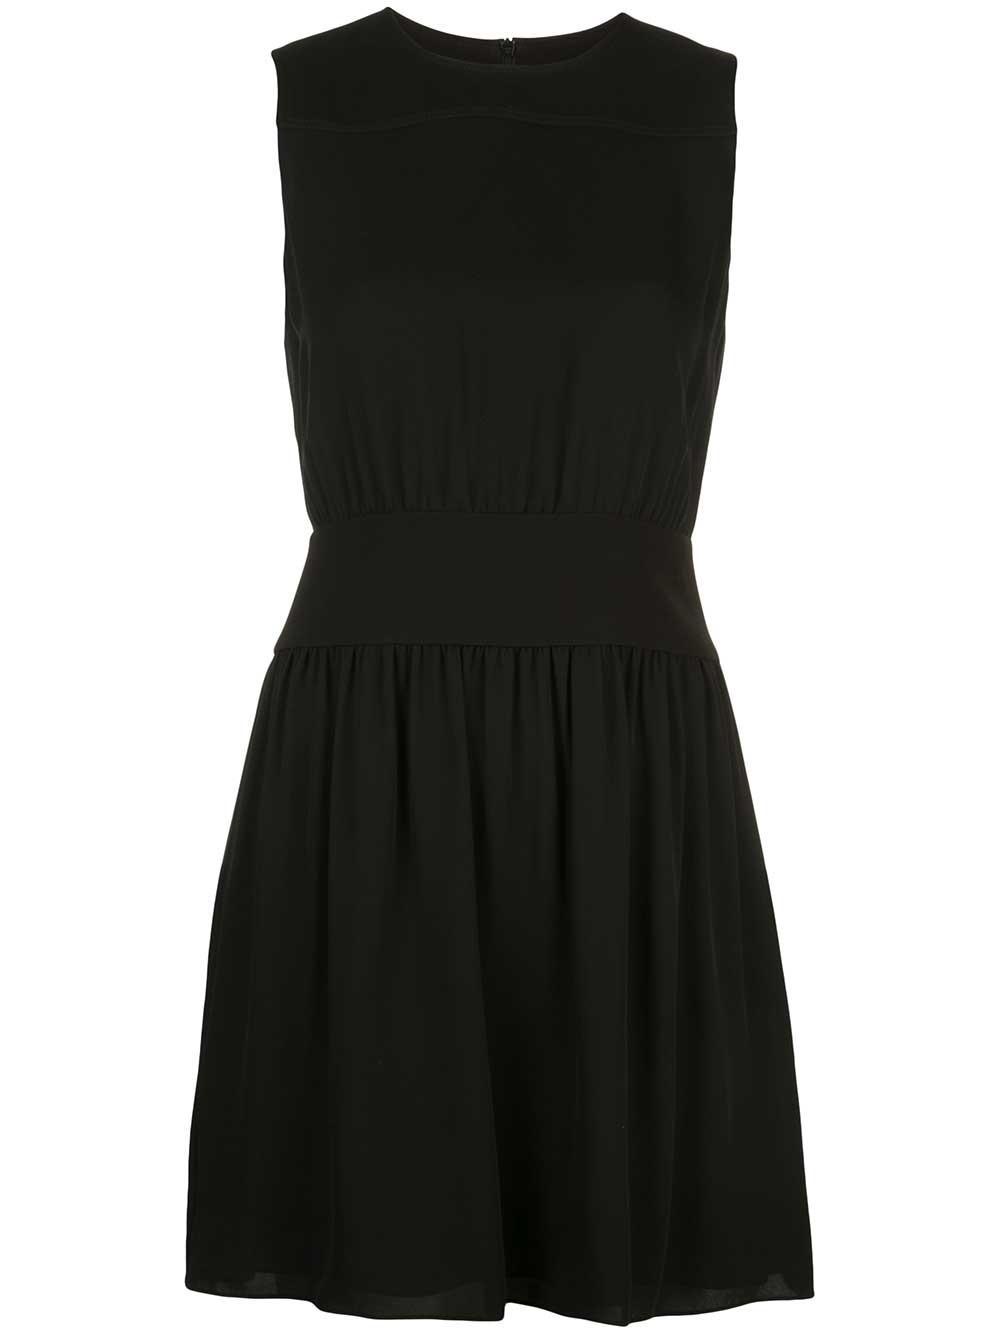 Blouson Sleeveless Dress